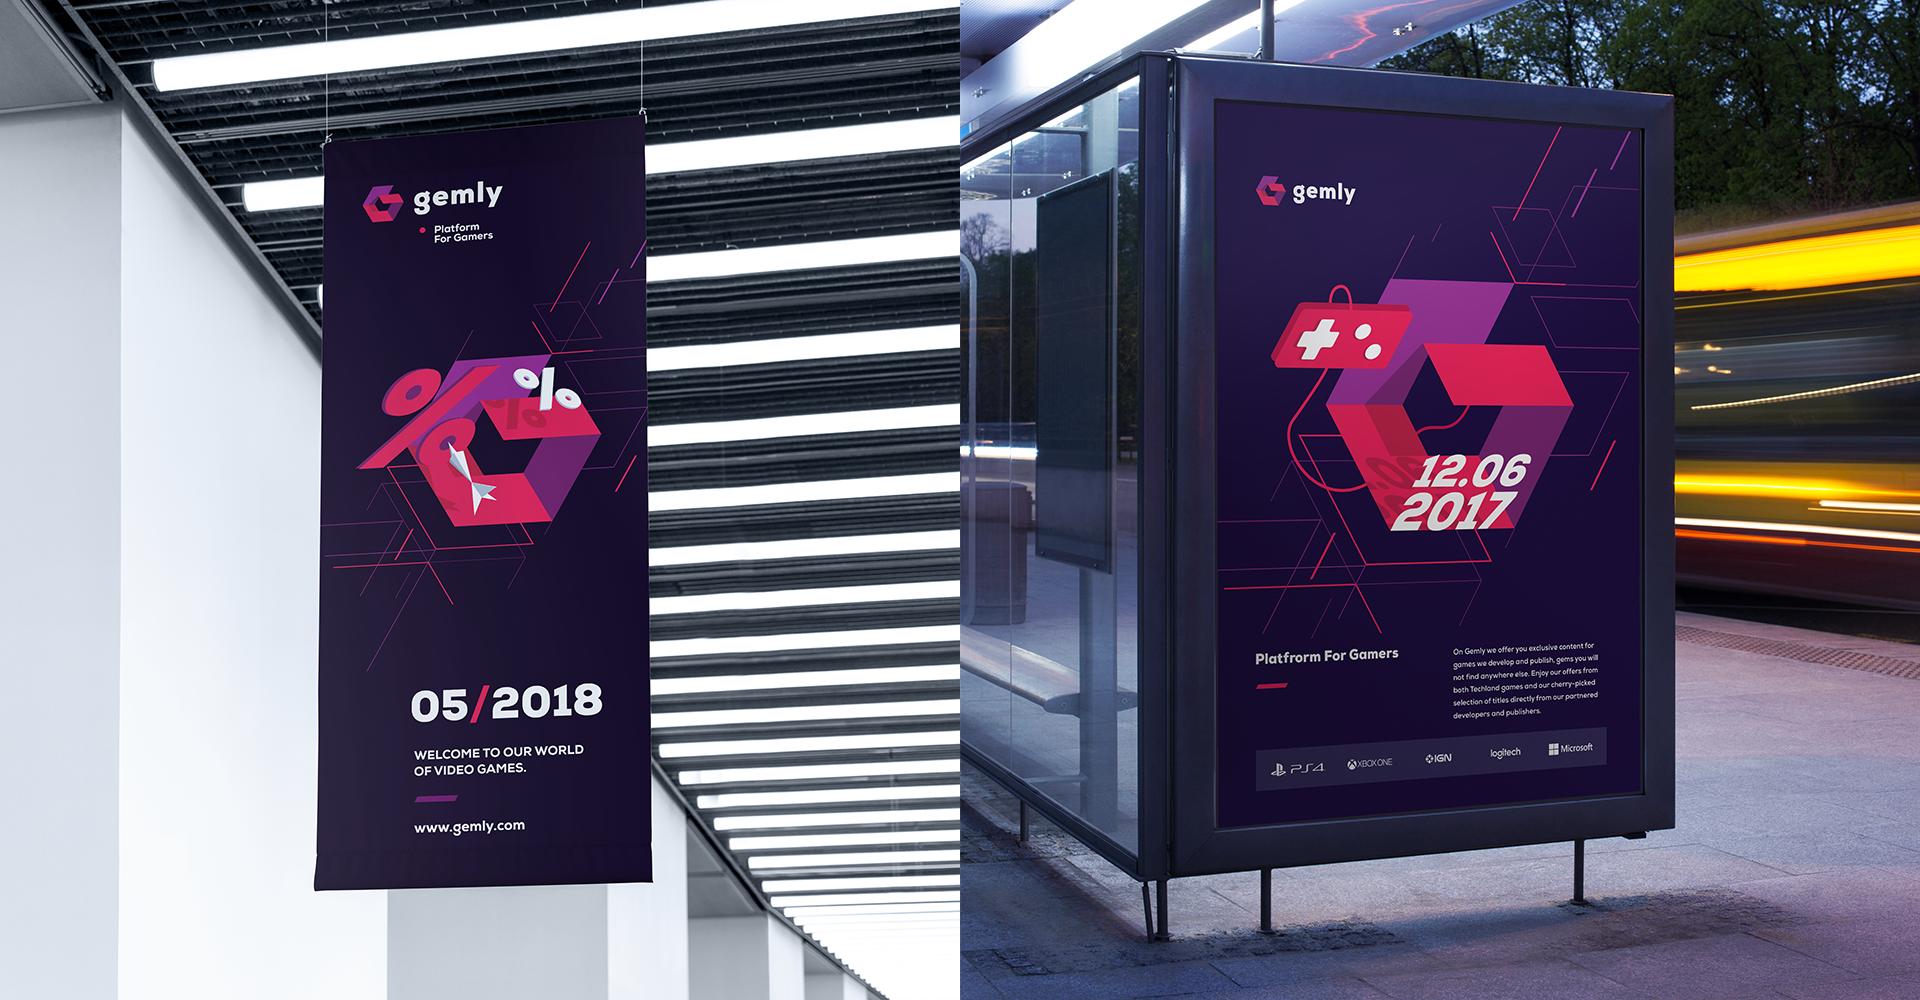 Gemly Techland's platform for gamers on Behance Gamer